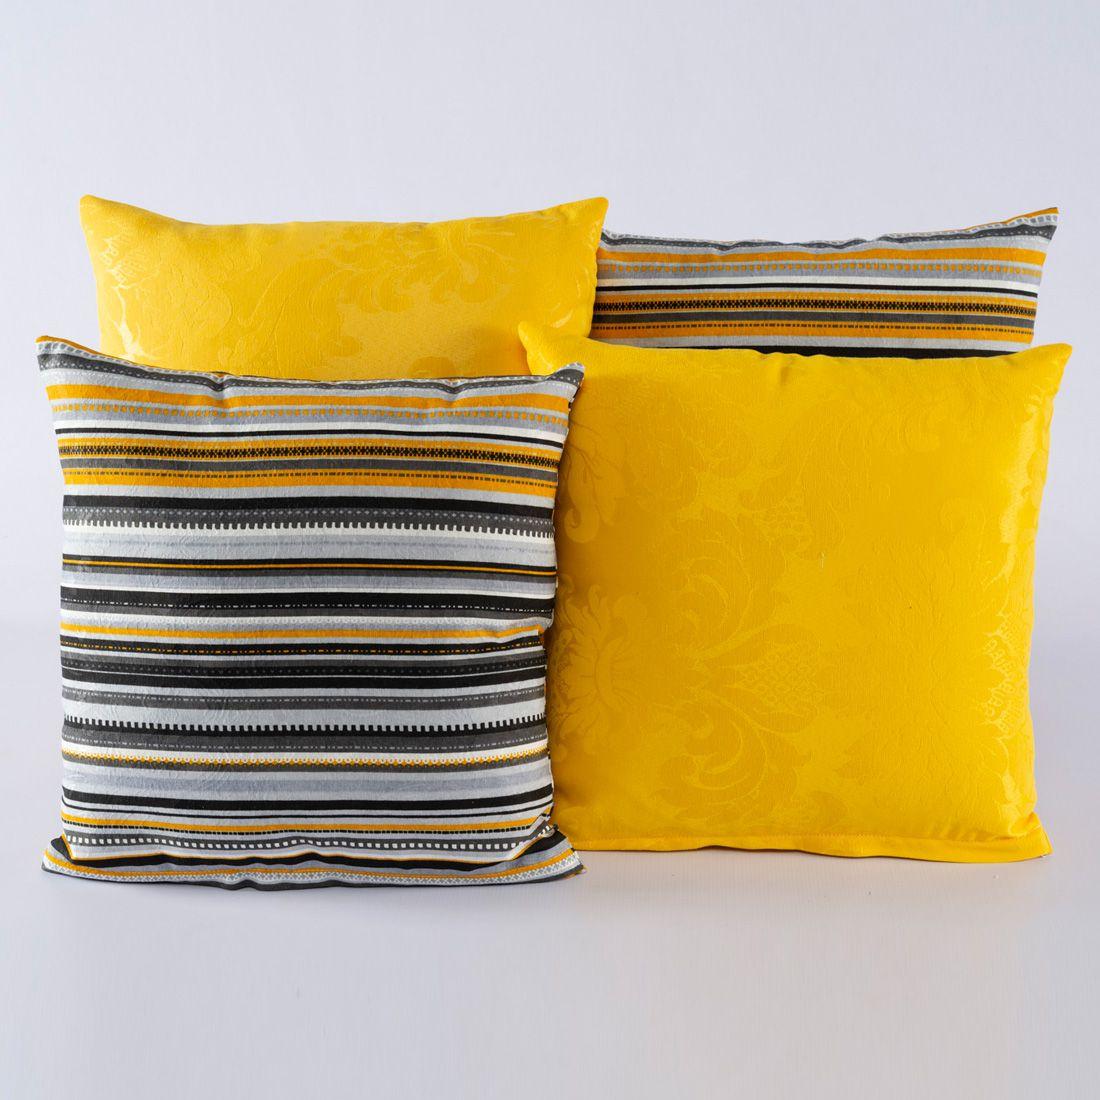 Kit c/ 4 Almofadas Cheias Decorativas Amarelo Listrado